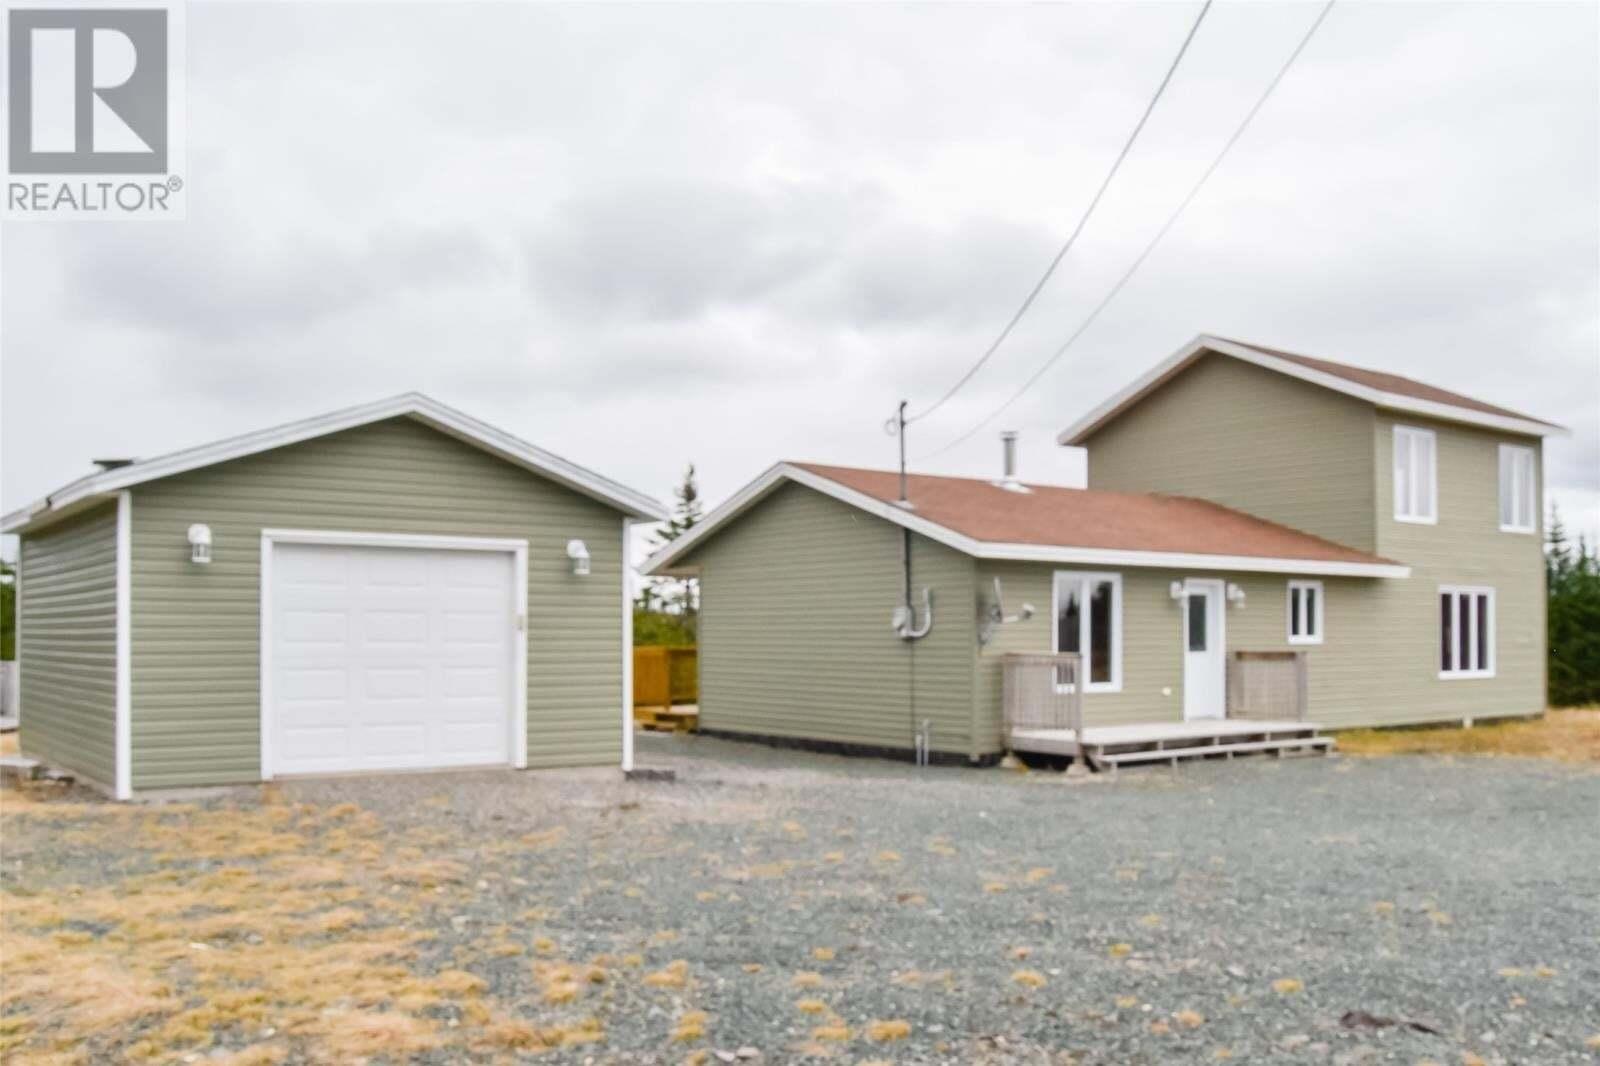 House for sale at 9 Fraser's Rd Holyrood Newfoundland - MLS: 1213945